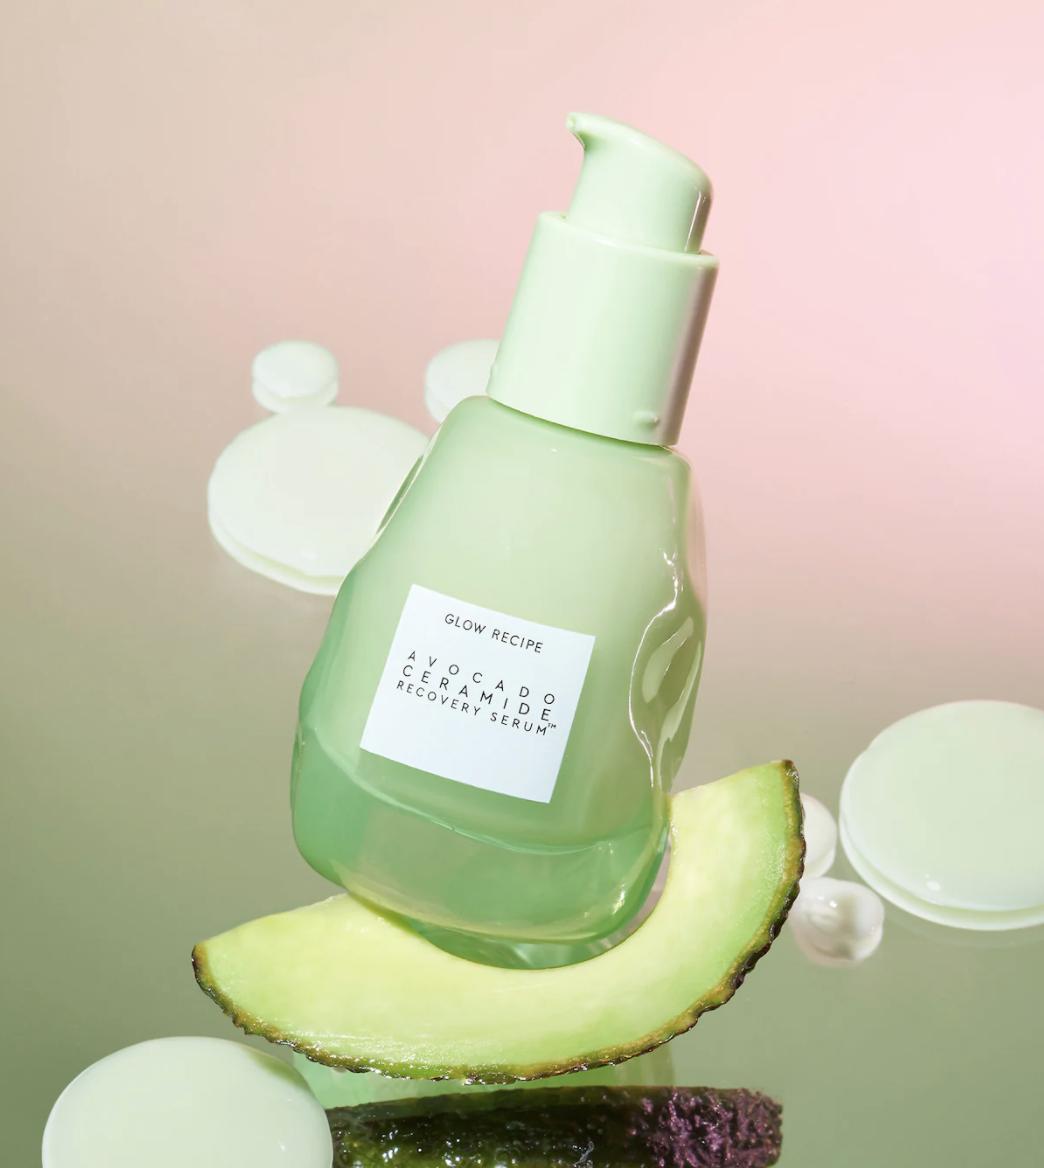 the bottle of serum on an avocado slice